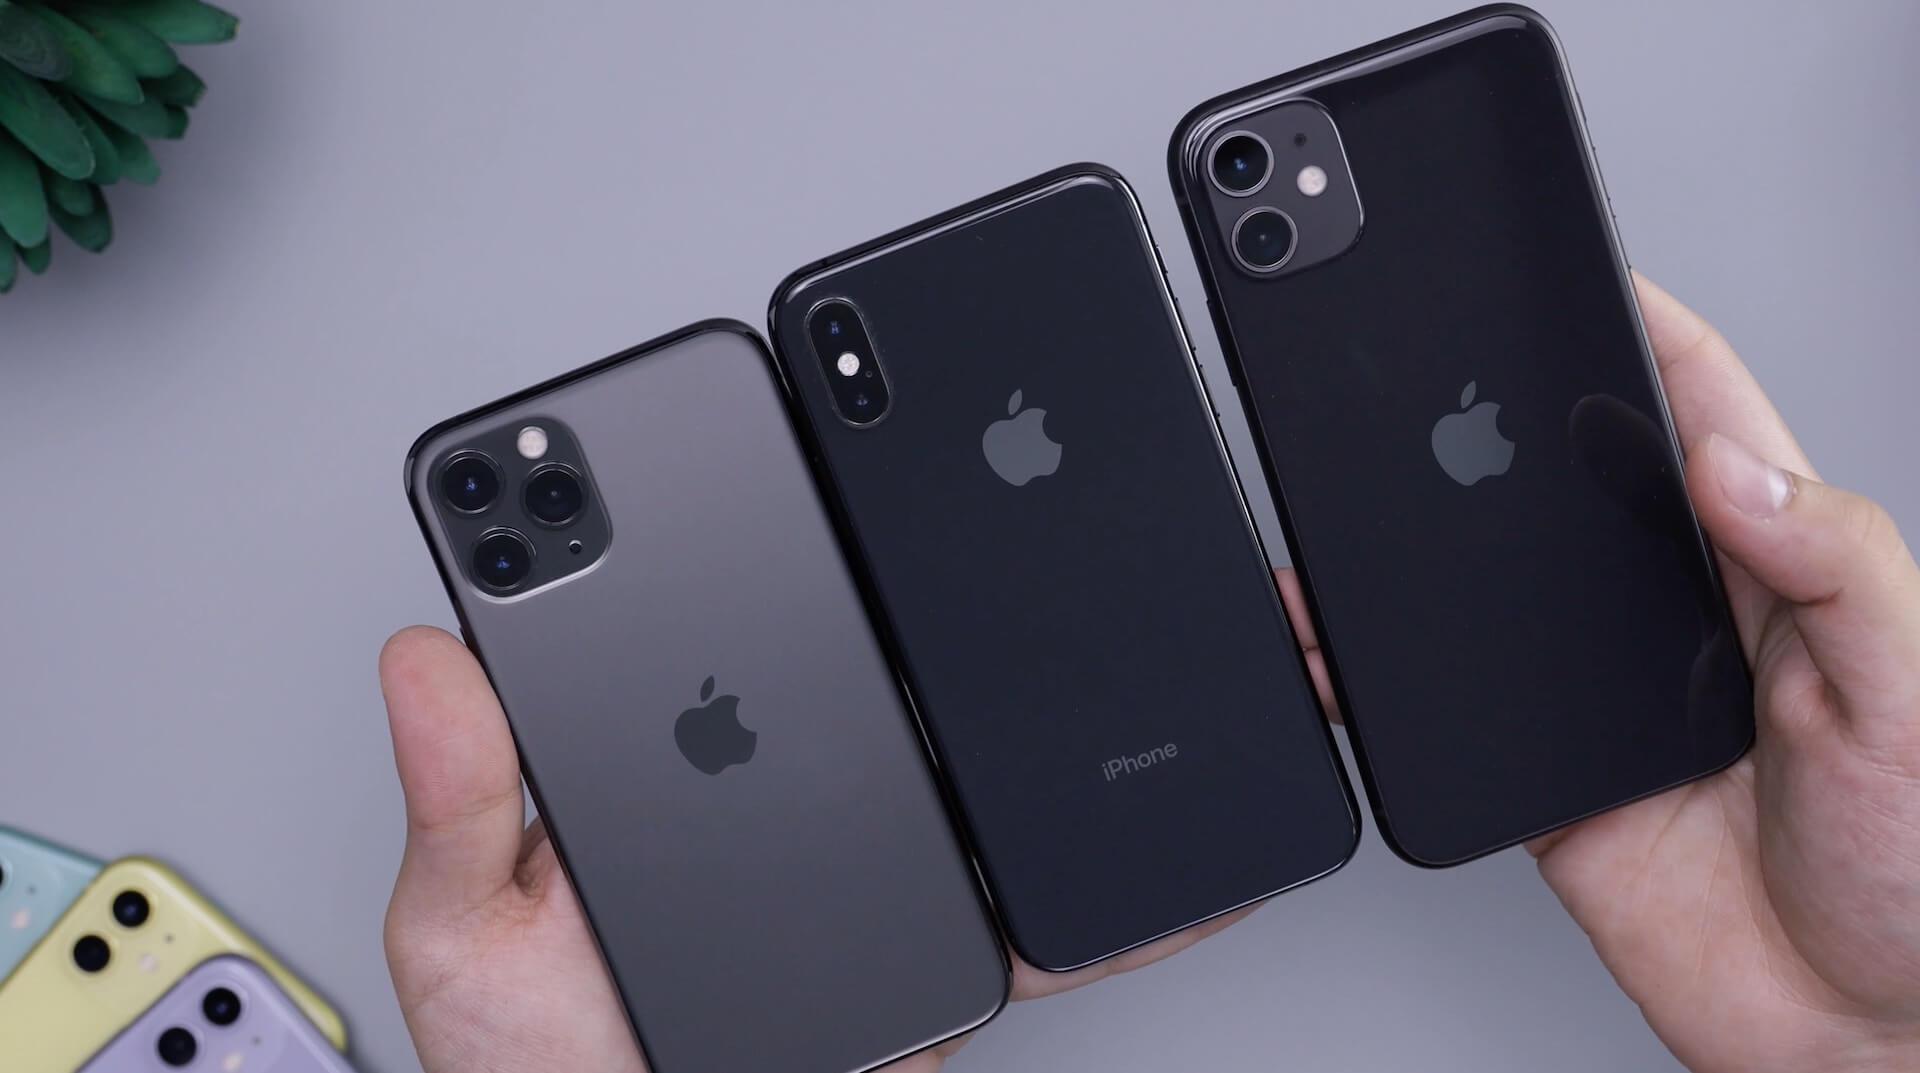 Apple、2021年からは新型iPhoneを春と秋に分けて発表か|来年春にはiPhone SE 2が登場? tech191204_apple_iphone_1